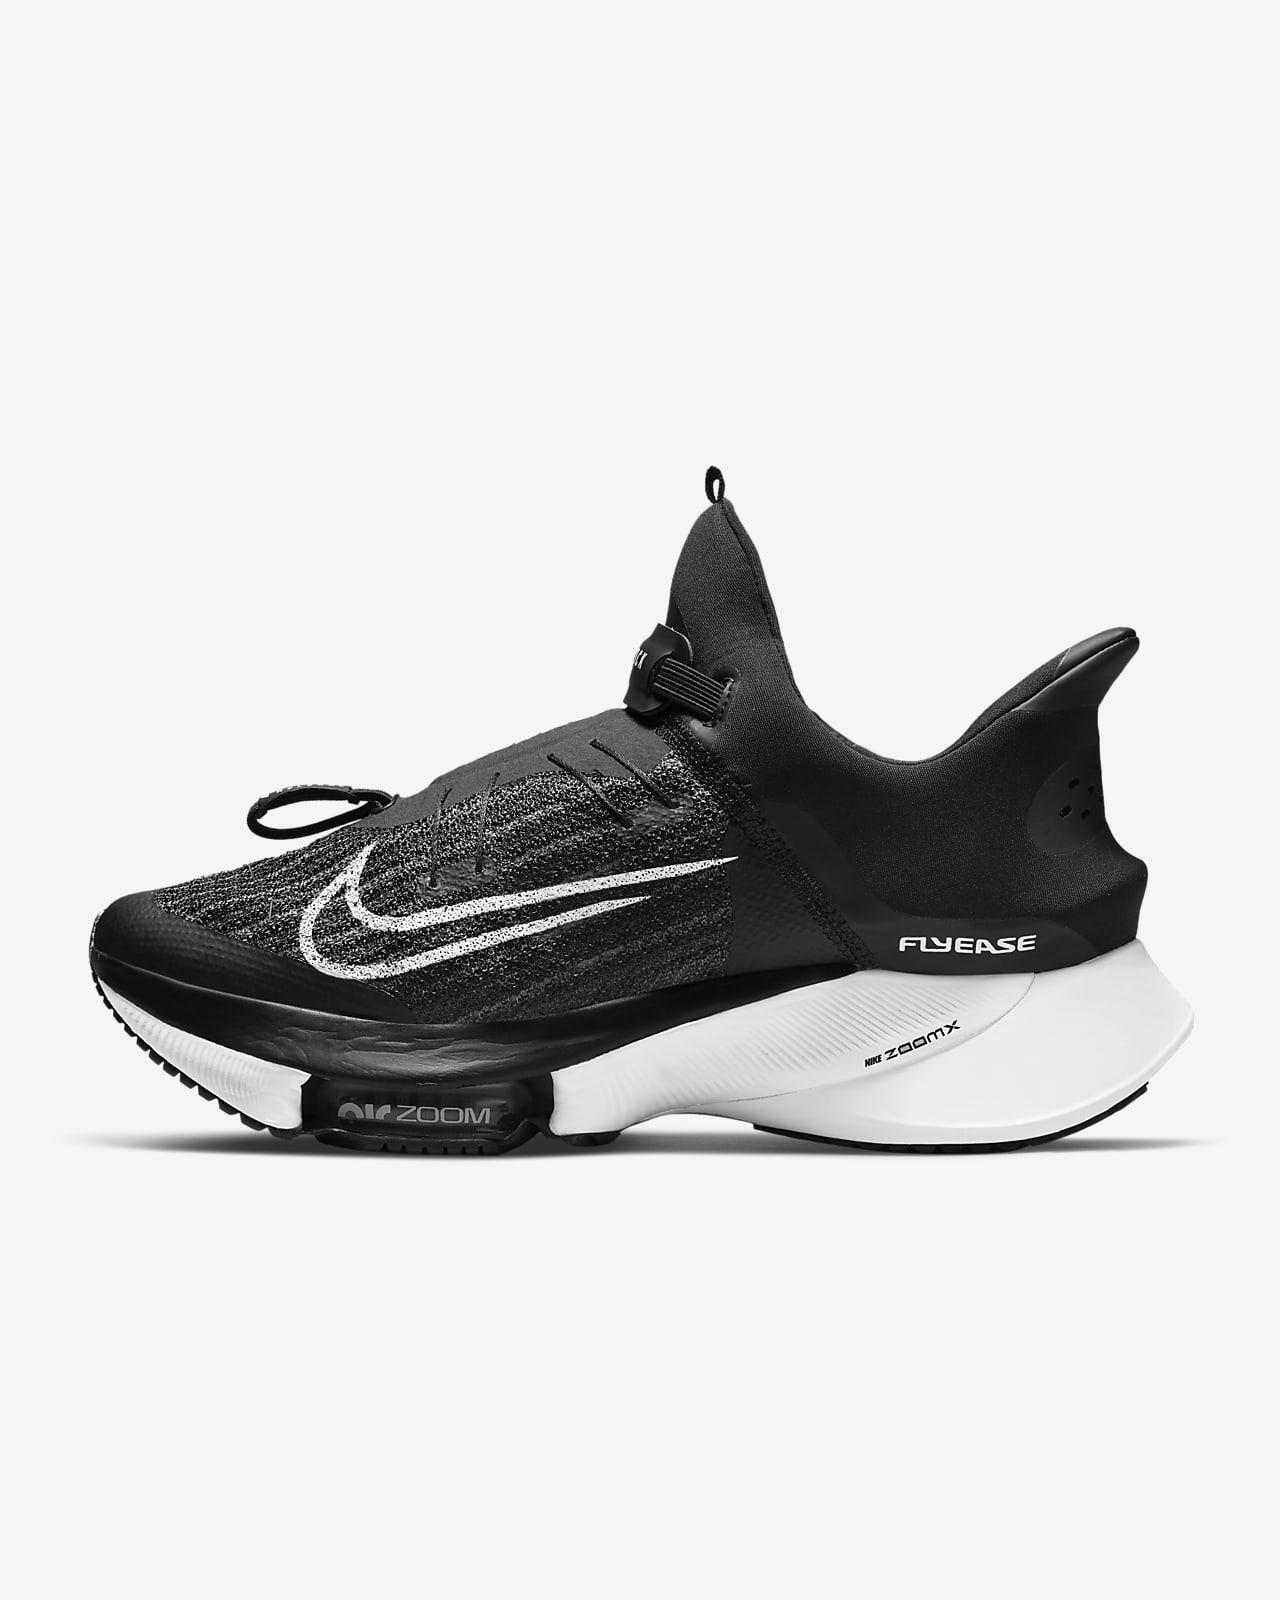 Scarpa da running su strada facile da indossare Nike Air Zoom Tempo NEXT% FlyEase - Uomo